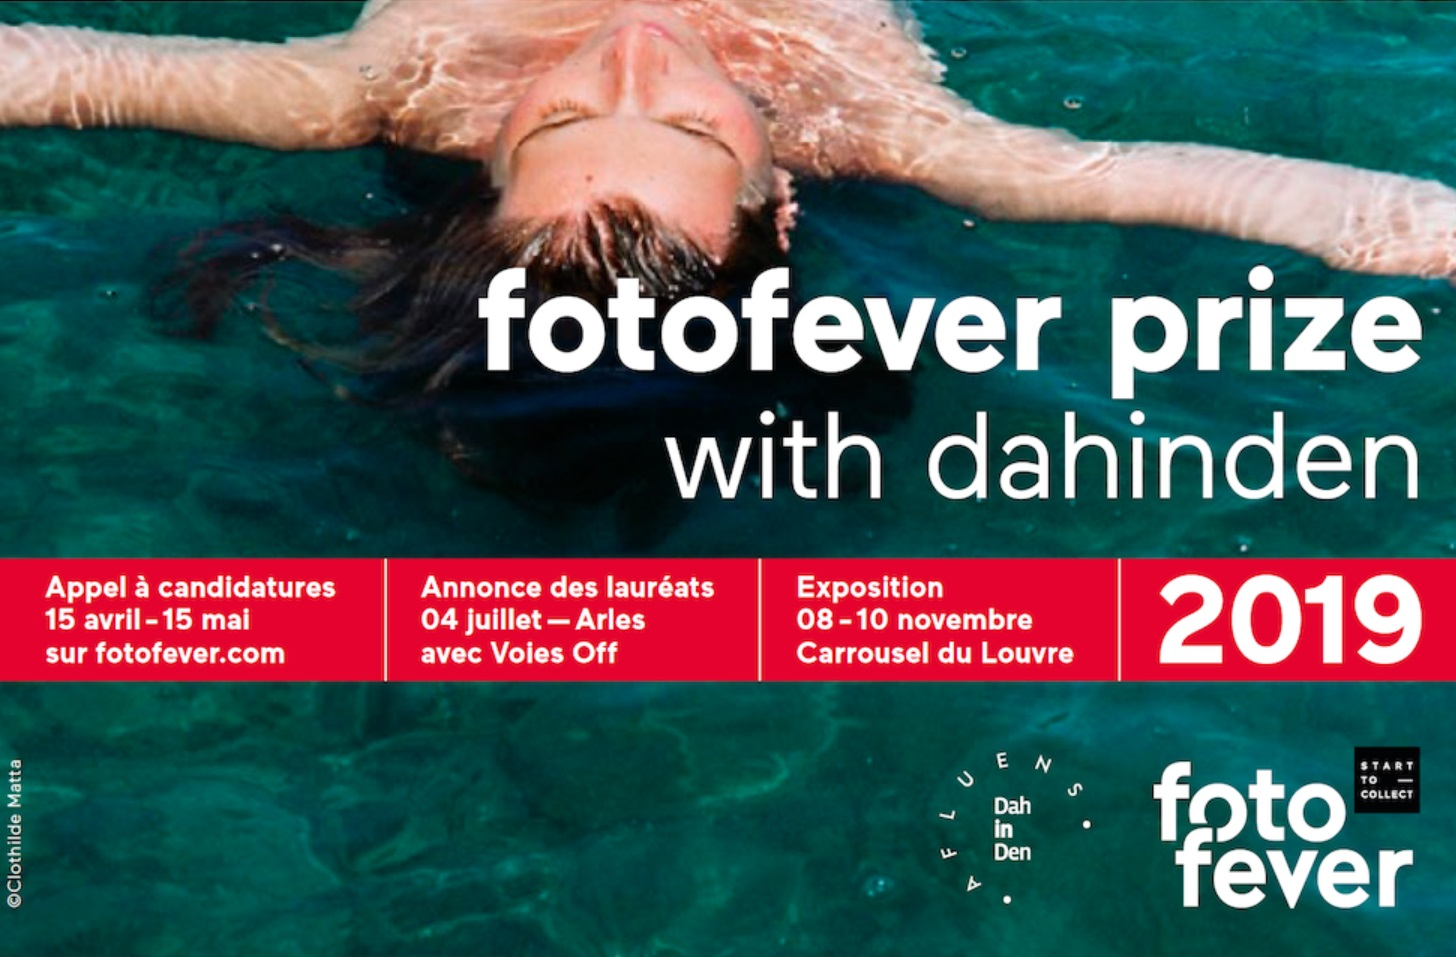 Fotofever Prize 2019 - logo